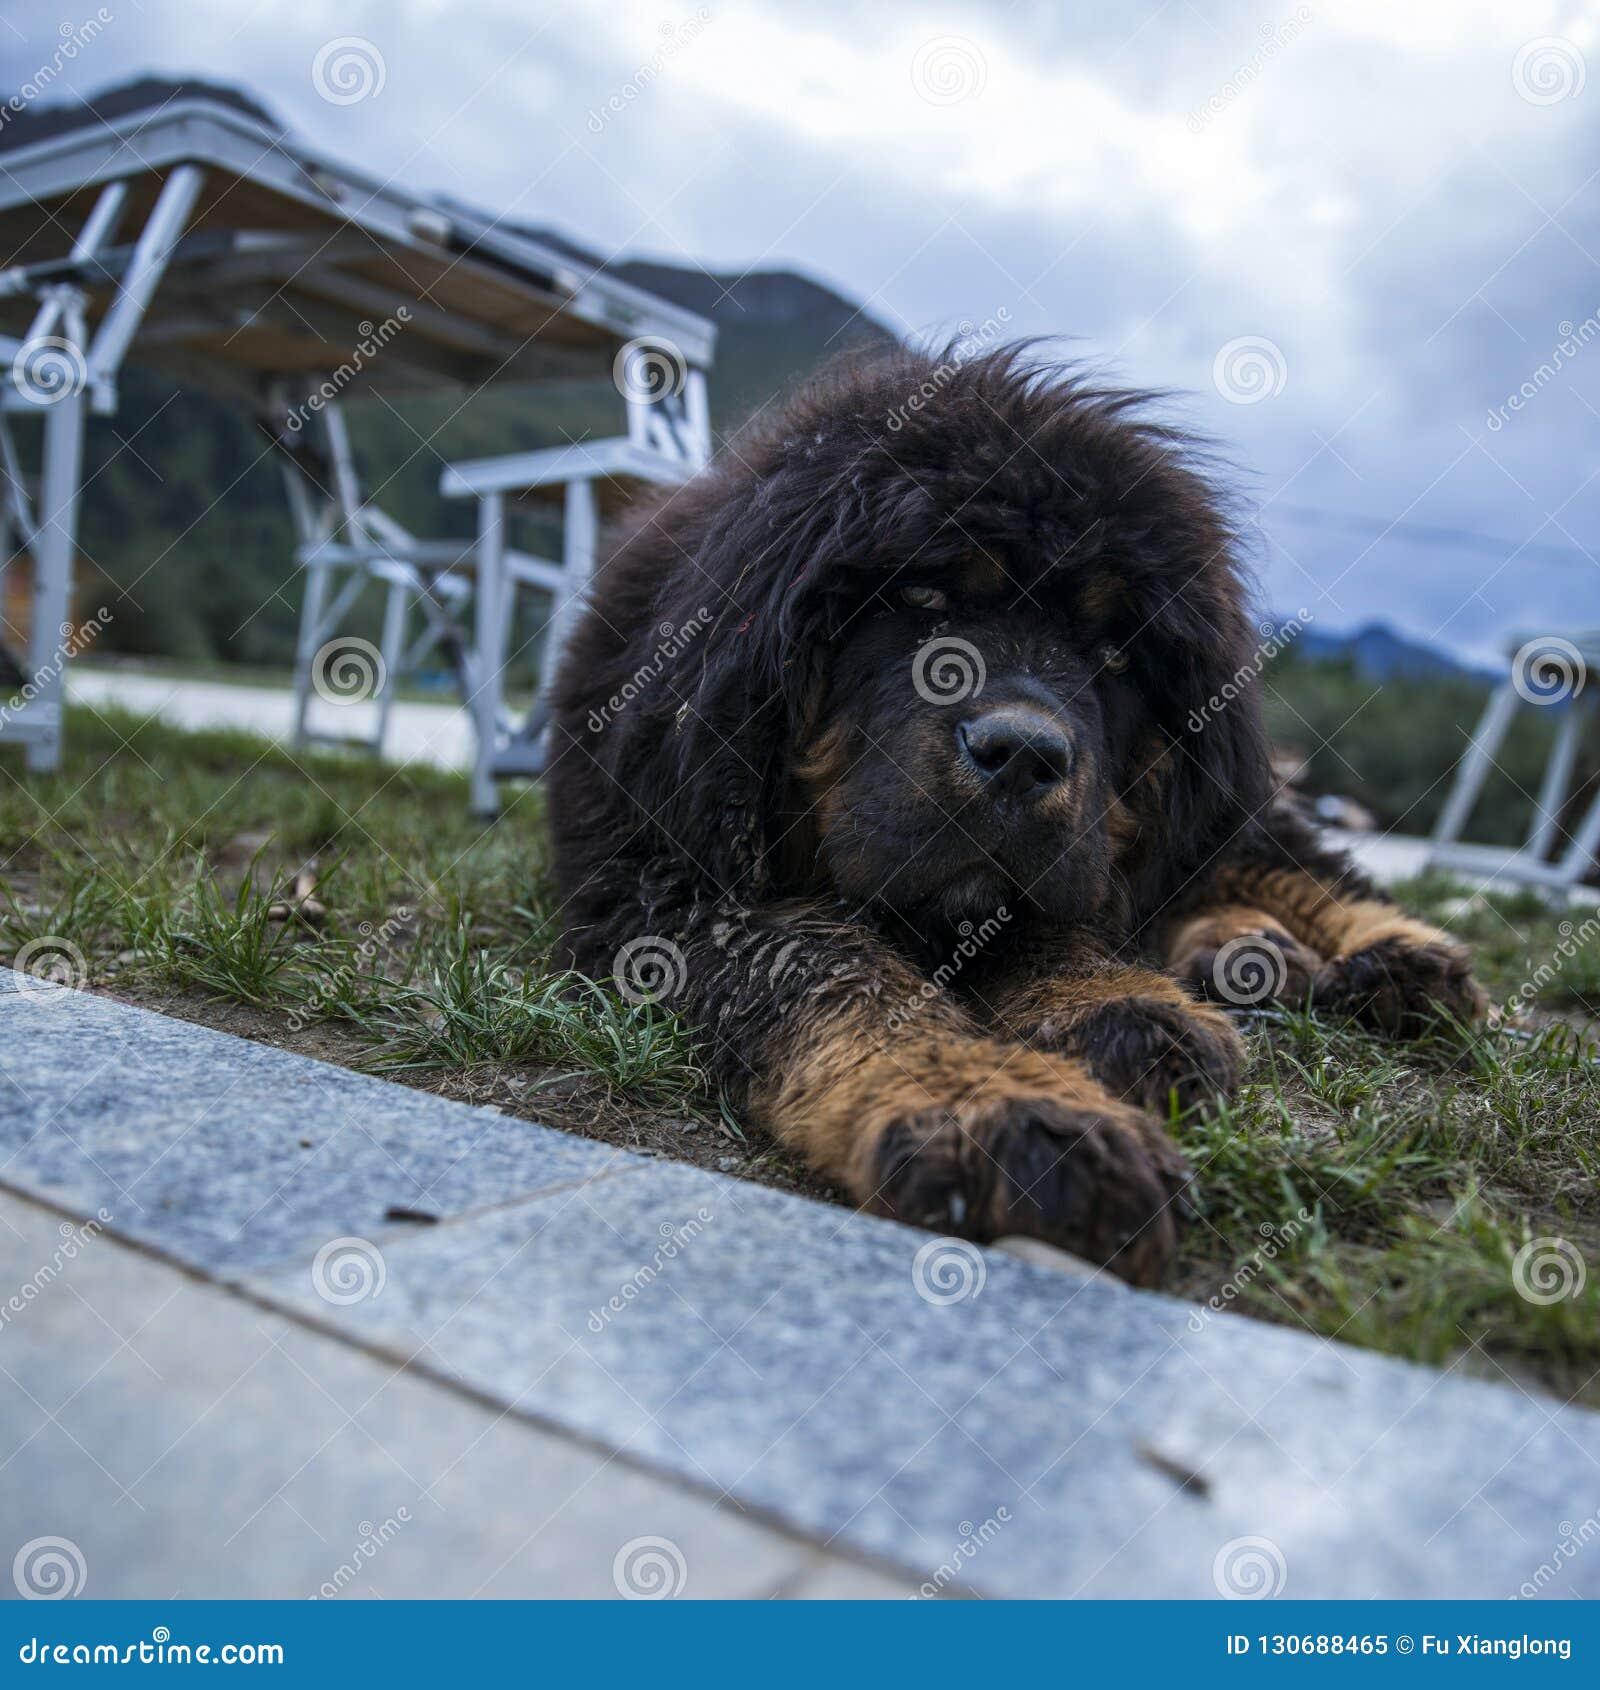 The Tibetan Mastiff Puppies Stock Image - Image of lettle